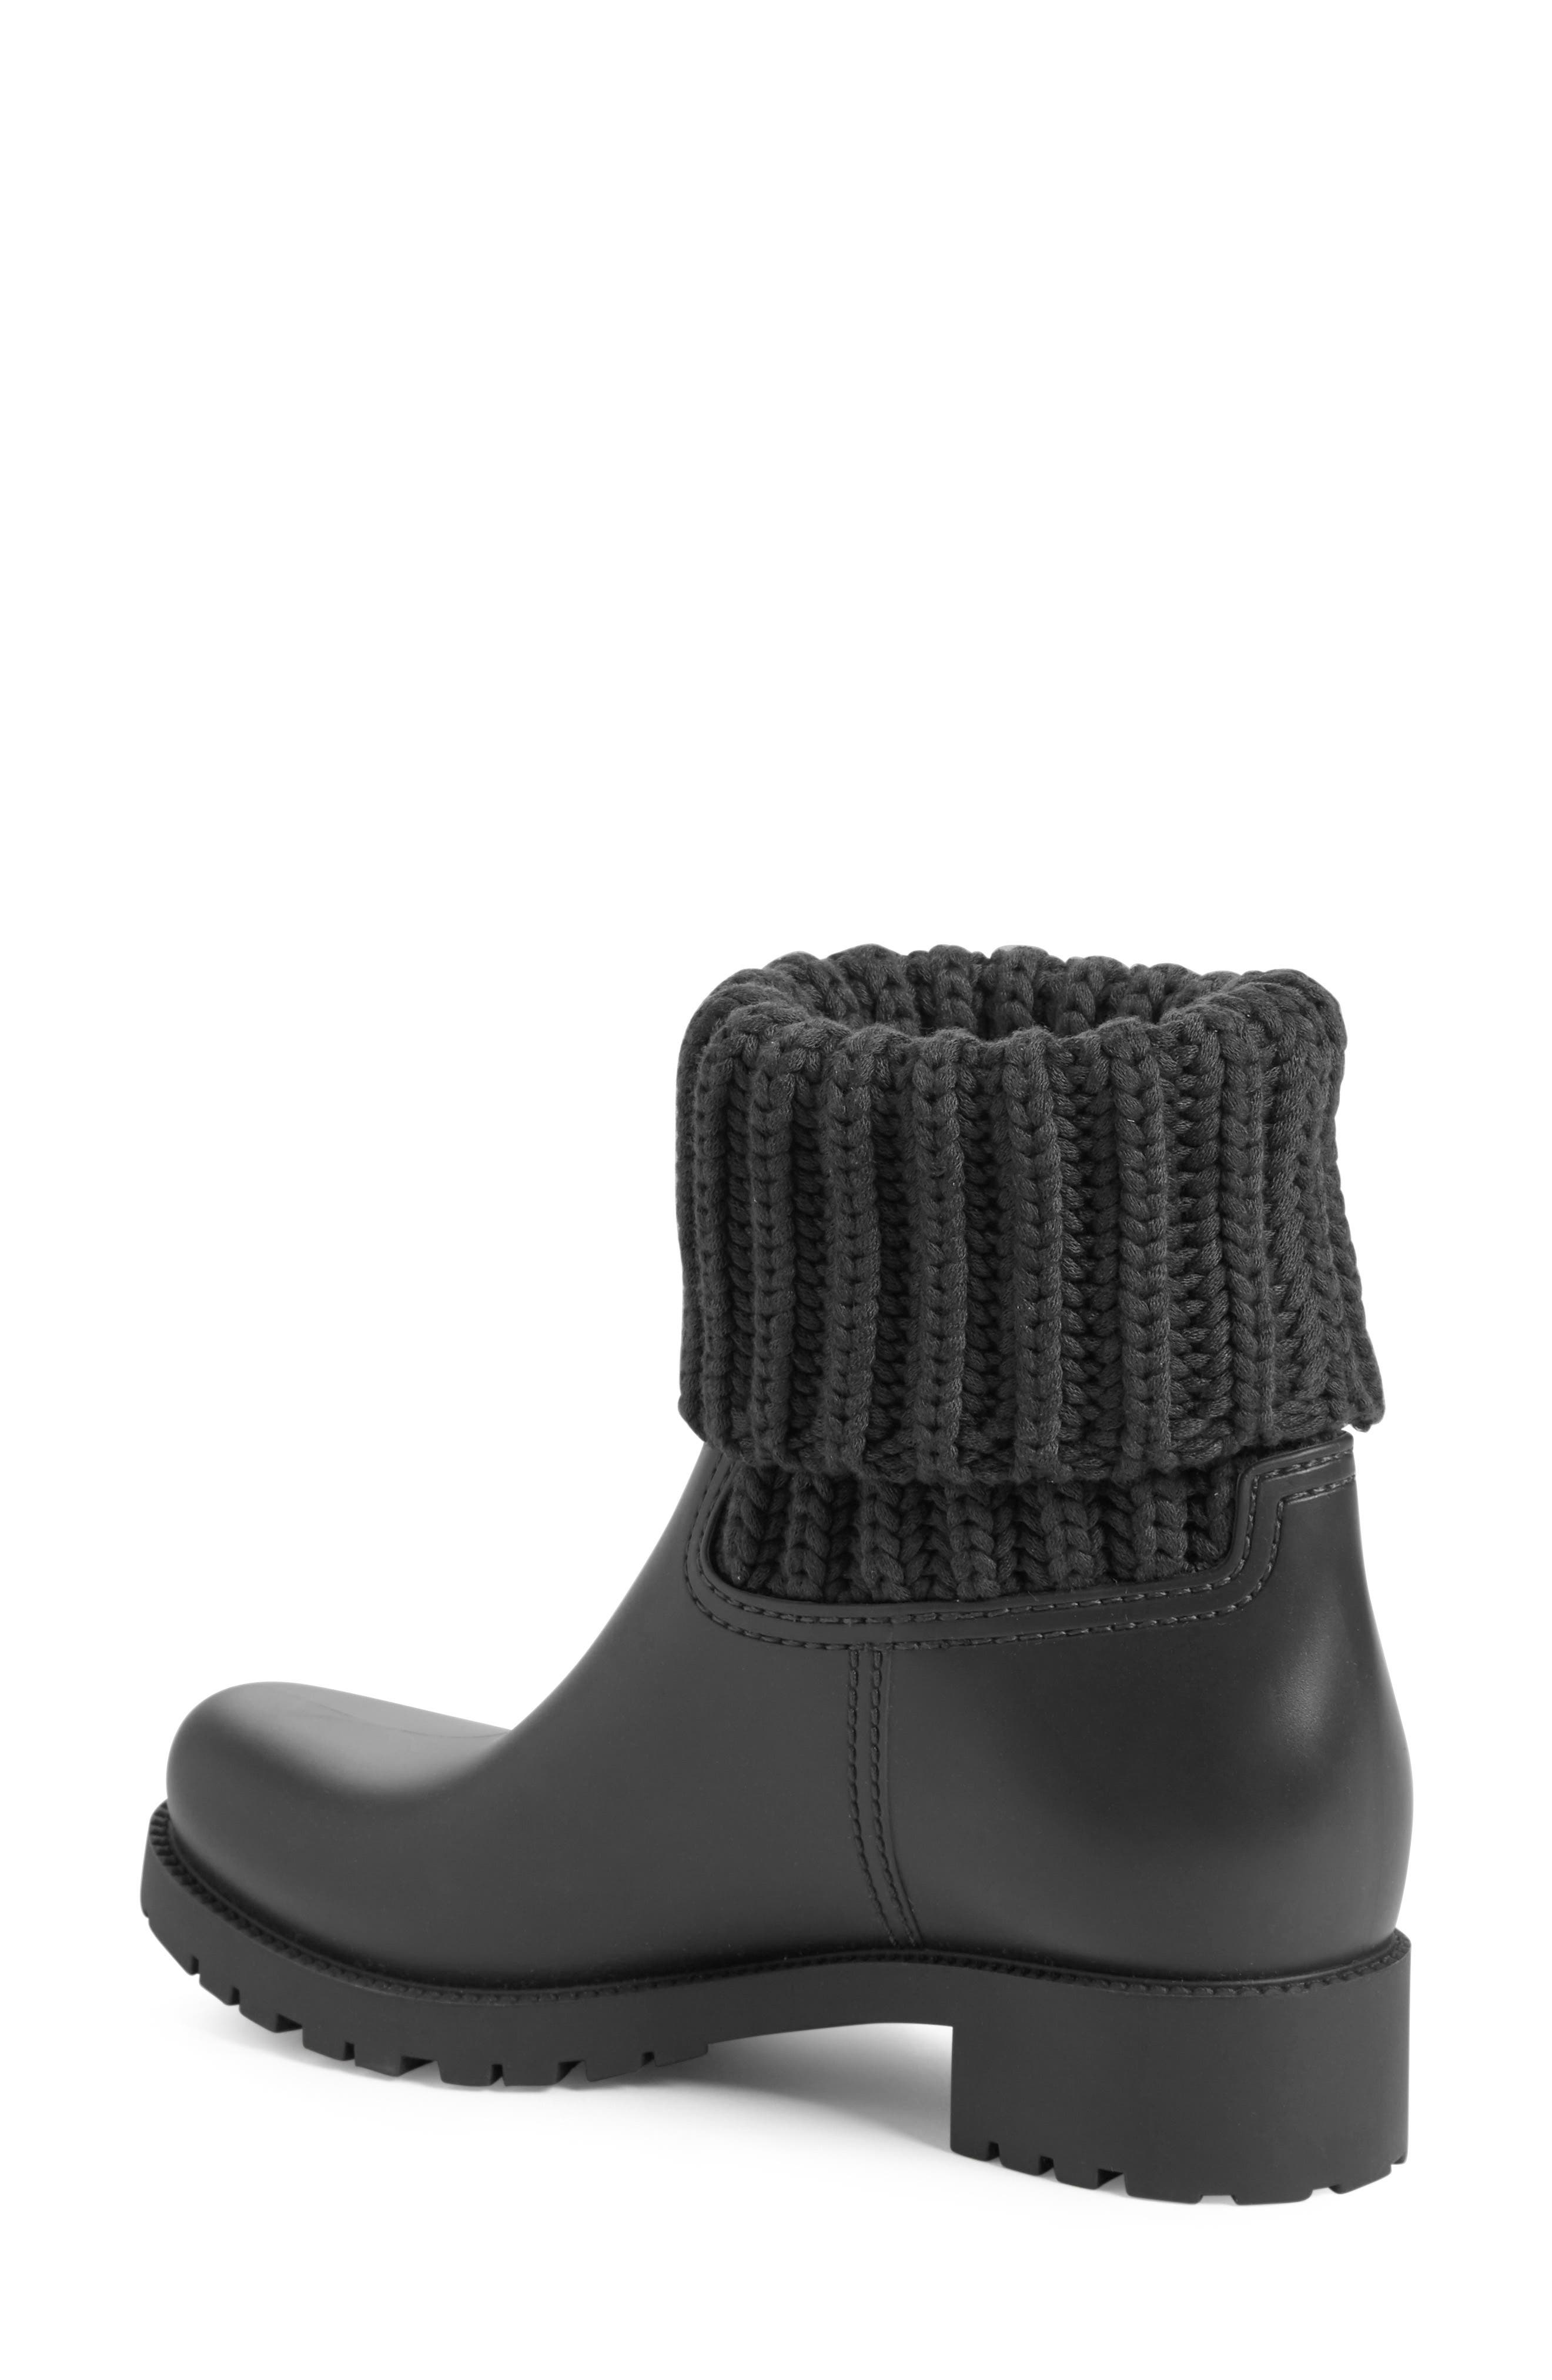 Alternate Image 2  - Moncler 'Ginette' Knit Cuff Leather Rain Boot (Women)